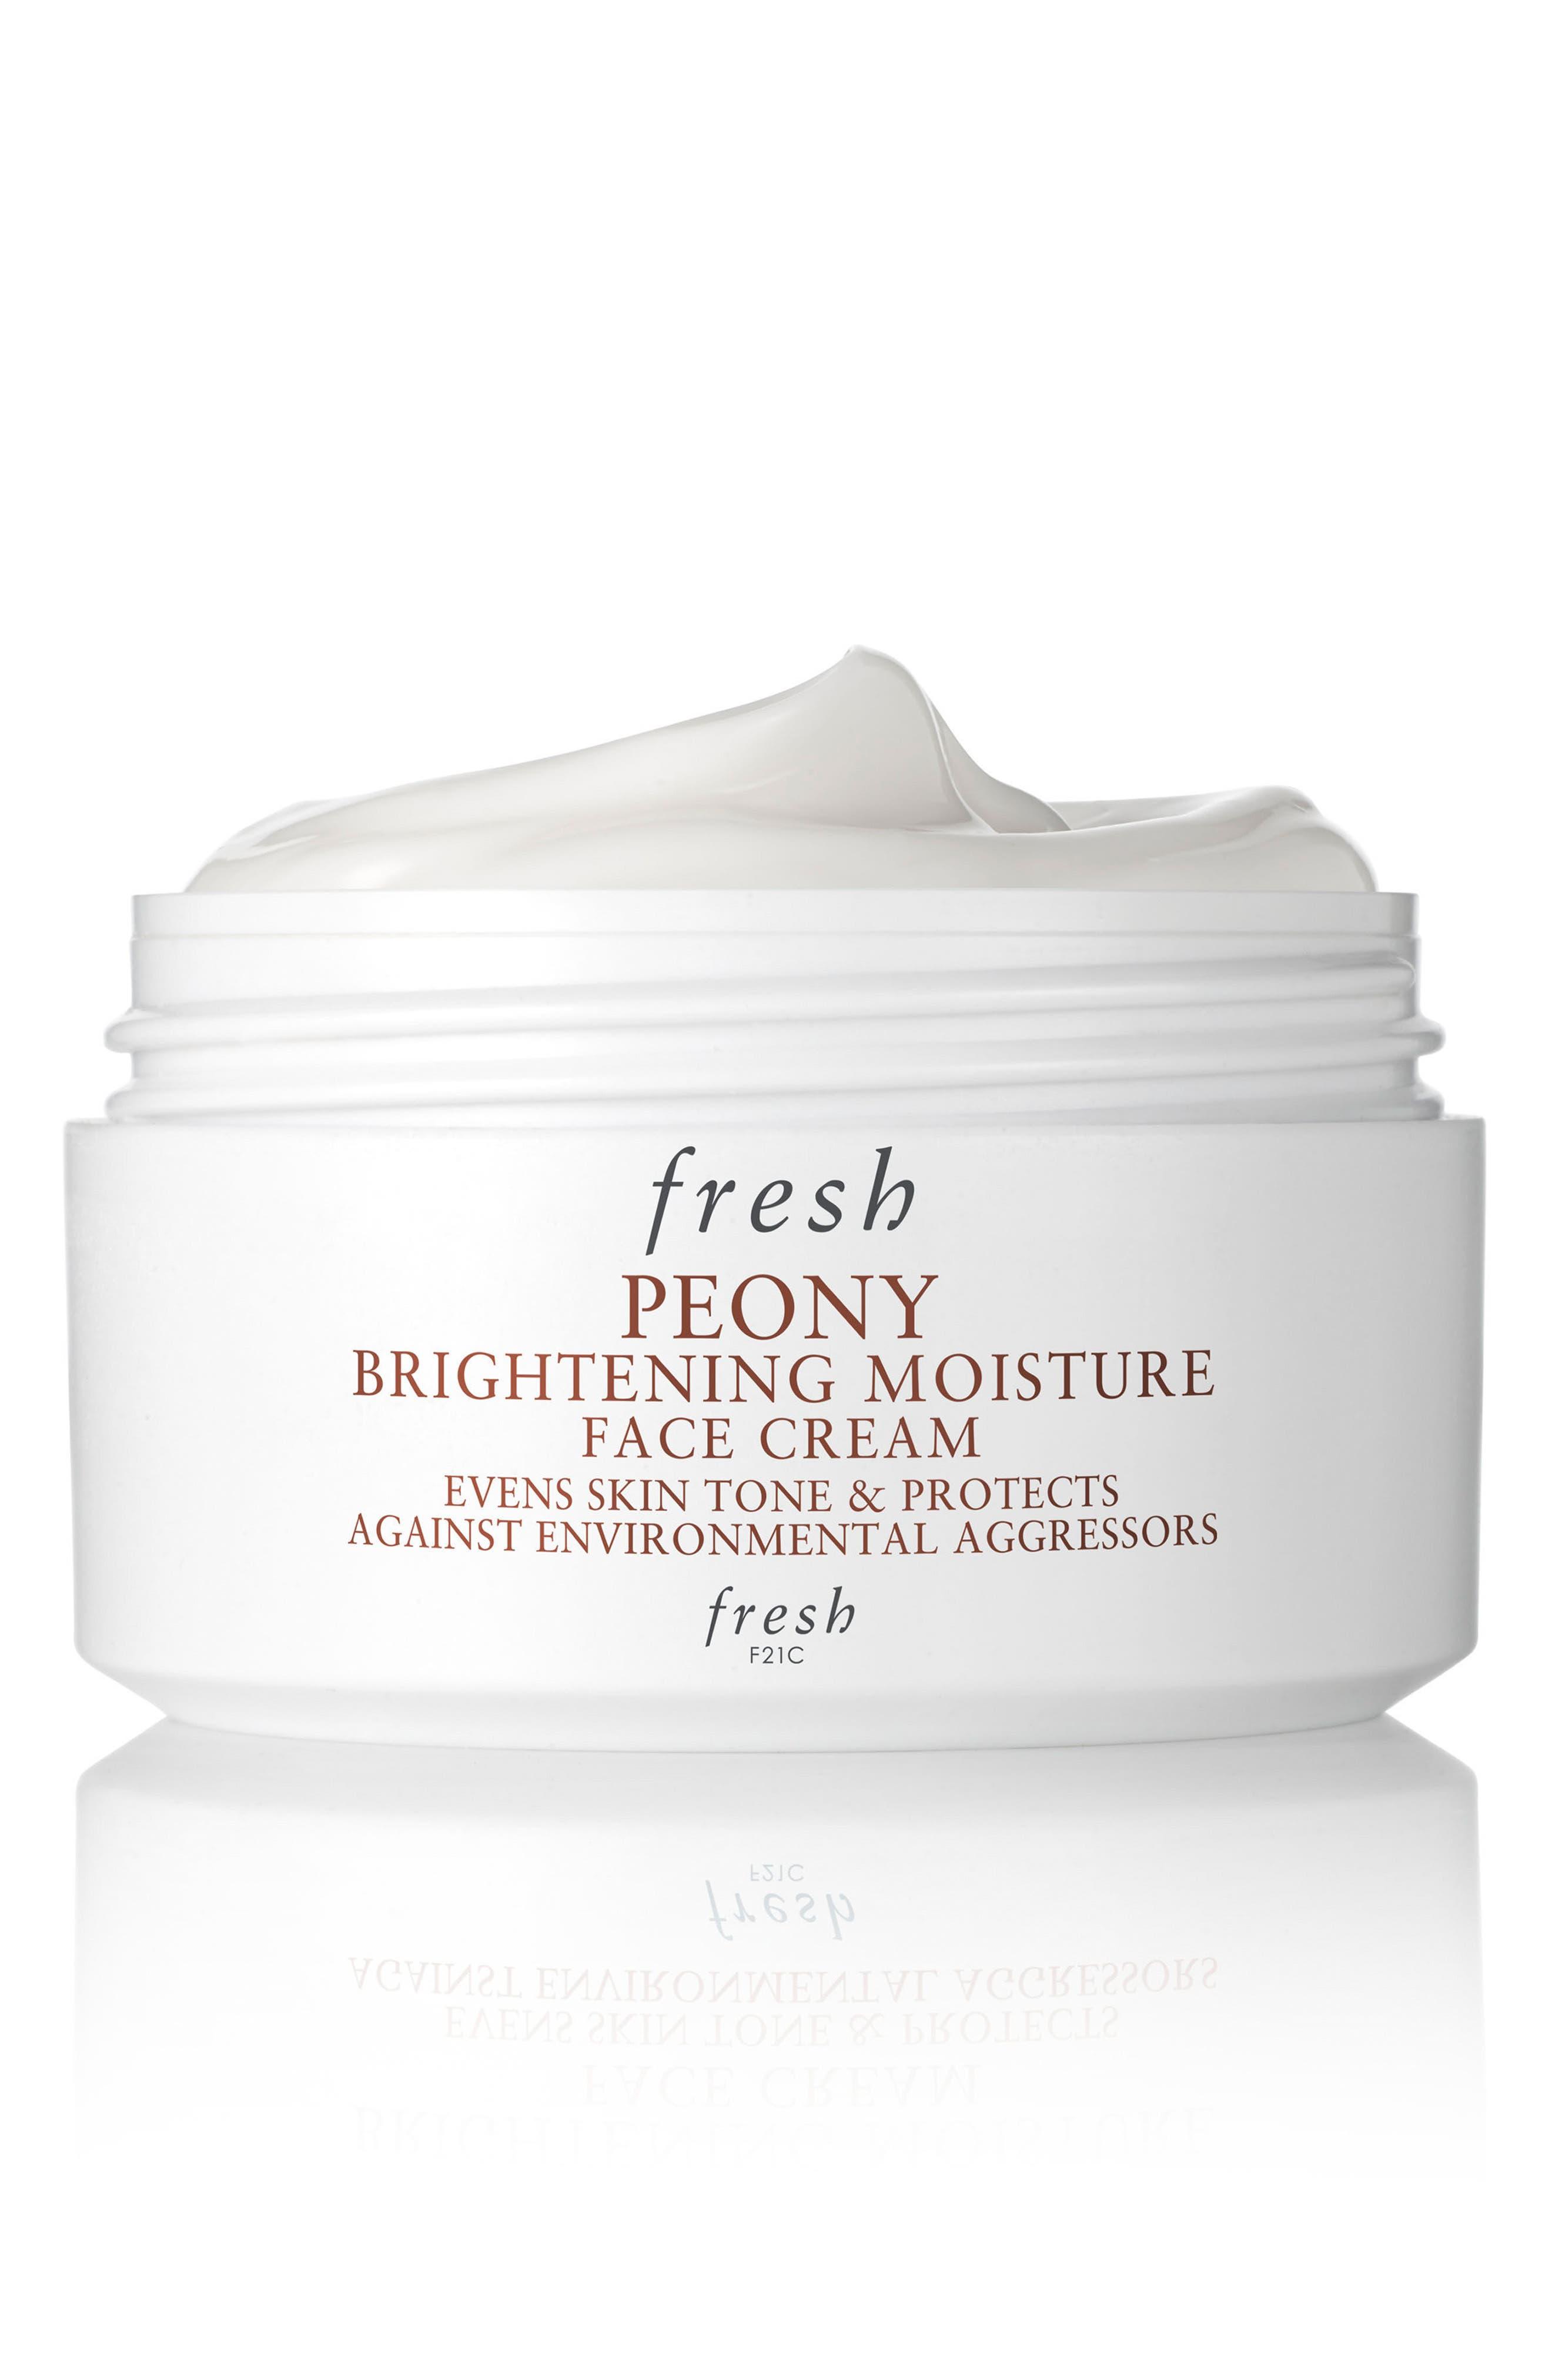 Fresh Peony Brightening Moisture Face Cream